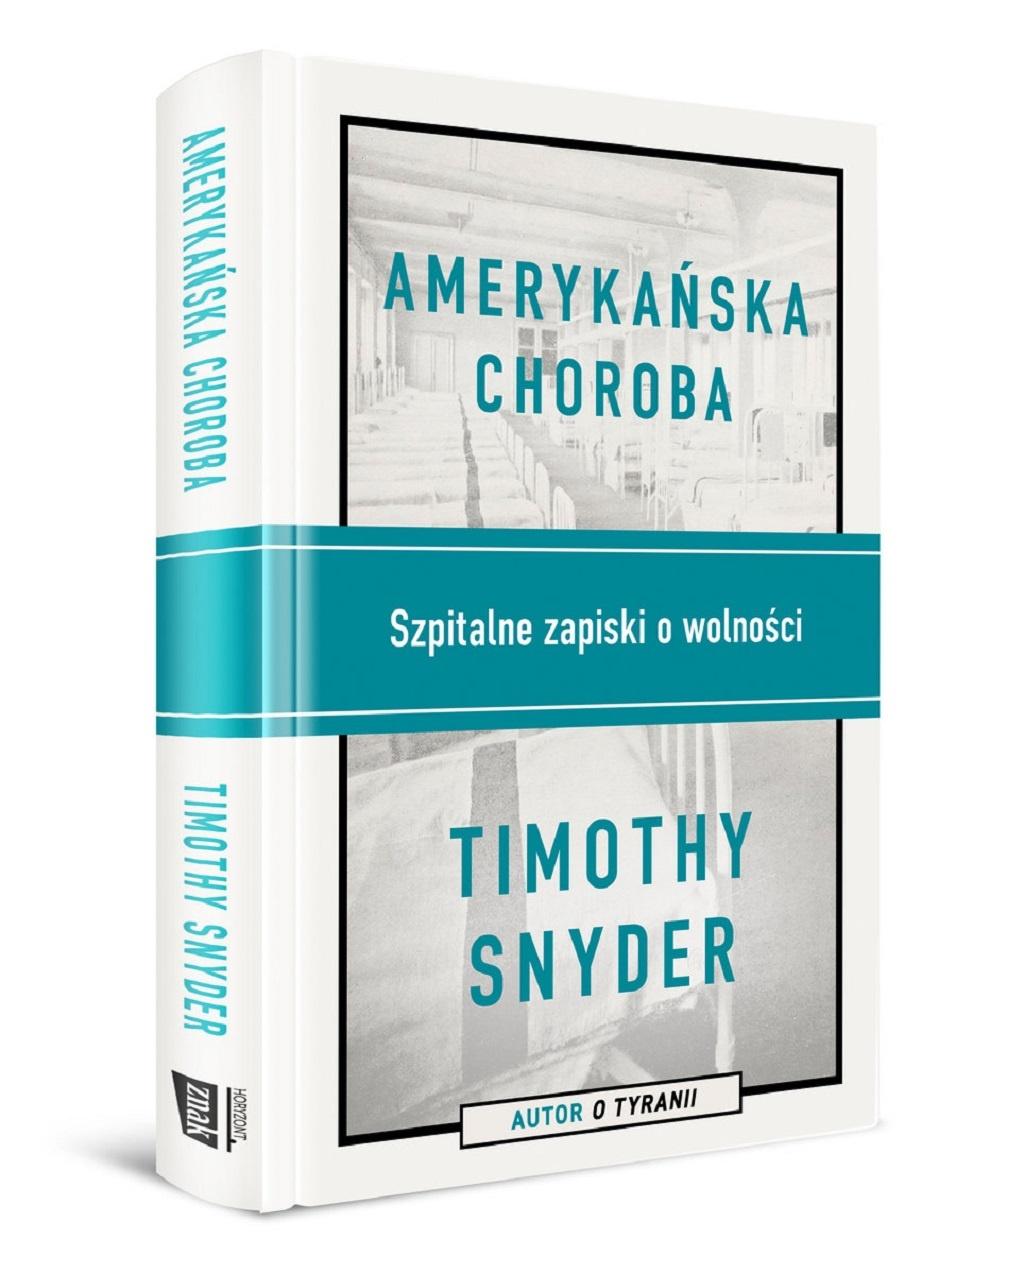 Timothy Snyder – Amerykańska choroba. Szpitalne zapiski o wolności